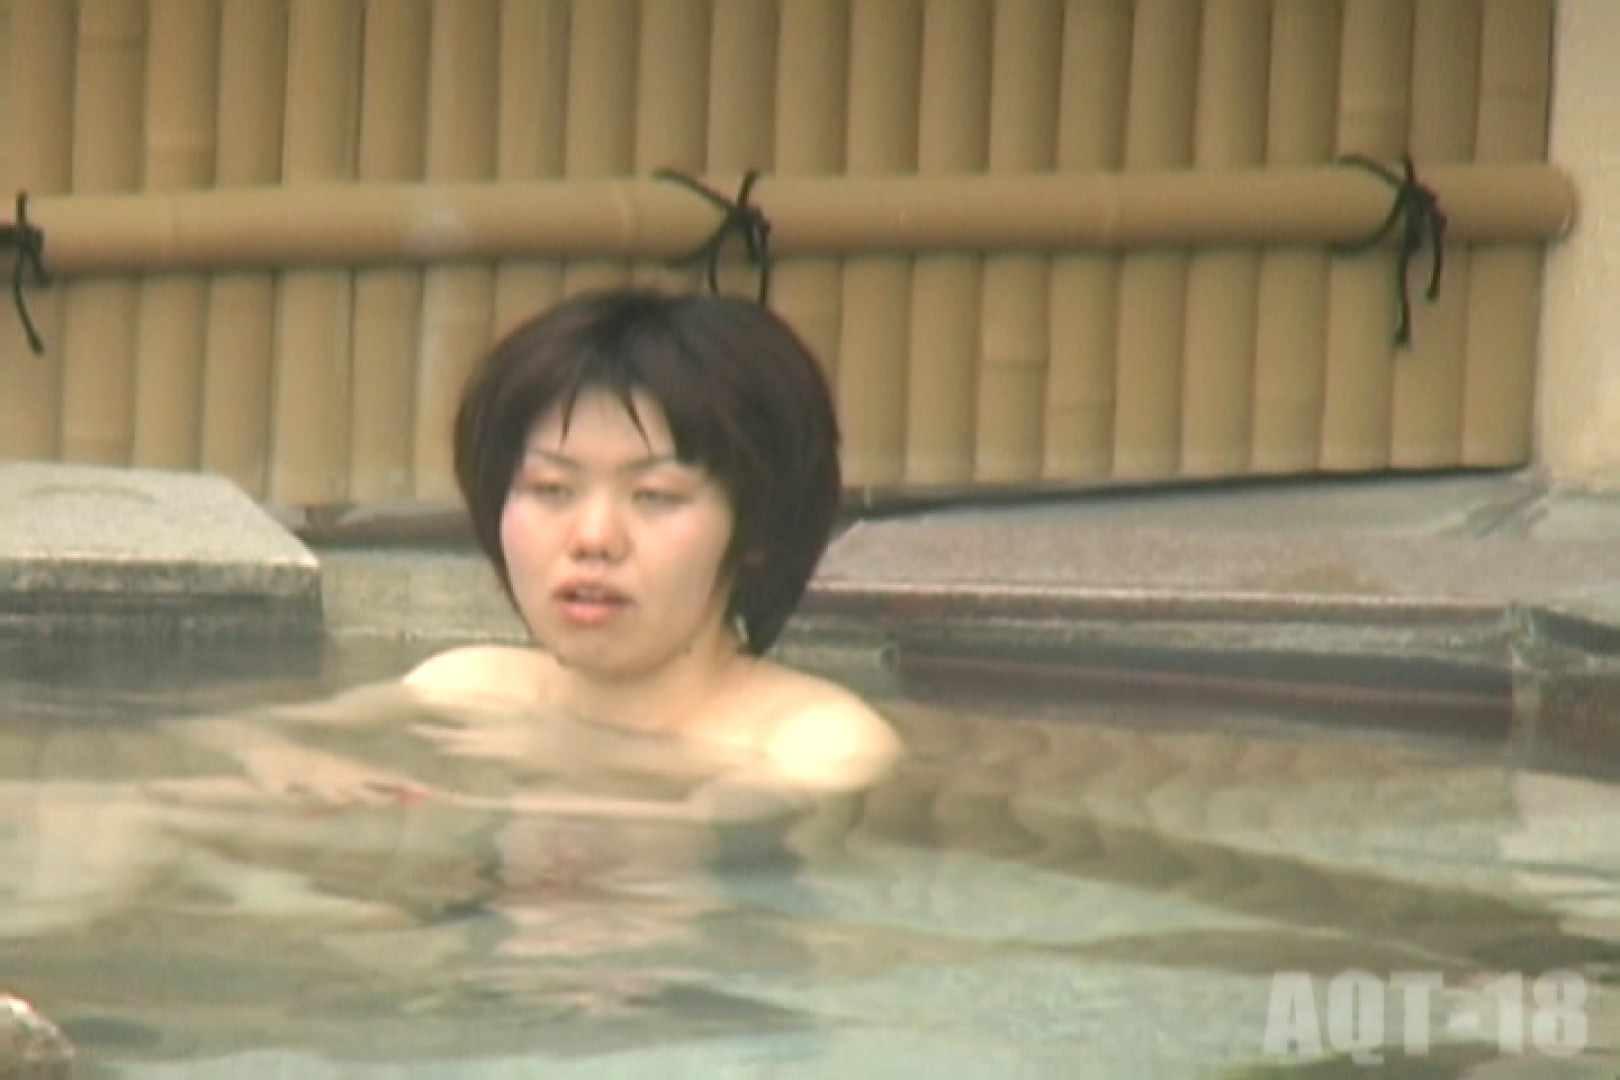 Aquaな露天風呂Vol.861 露天風呂突入 AV無料 104pic 2